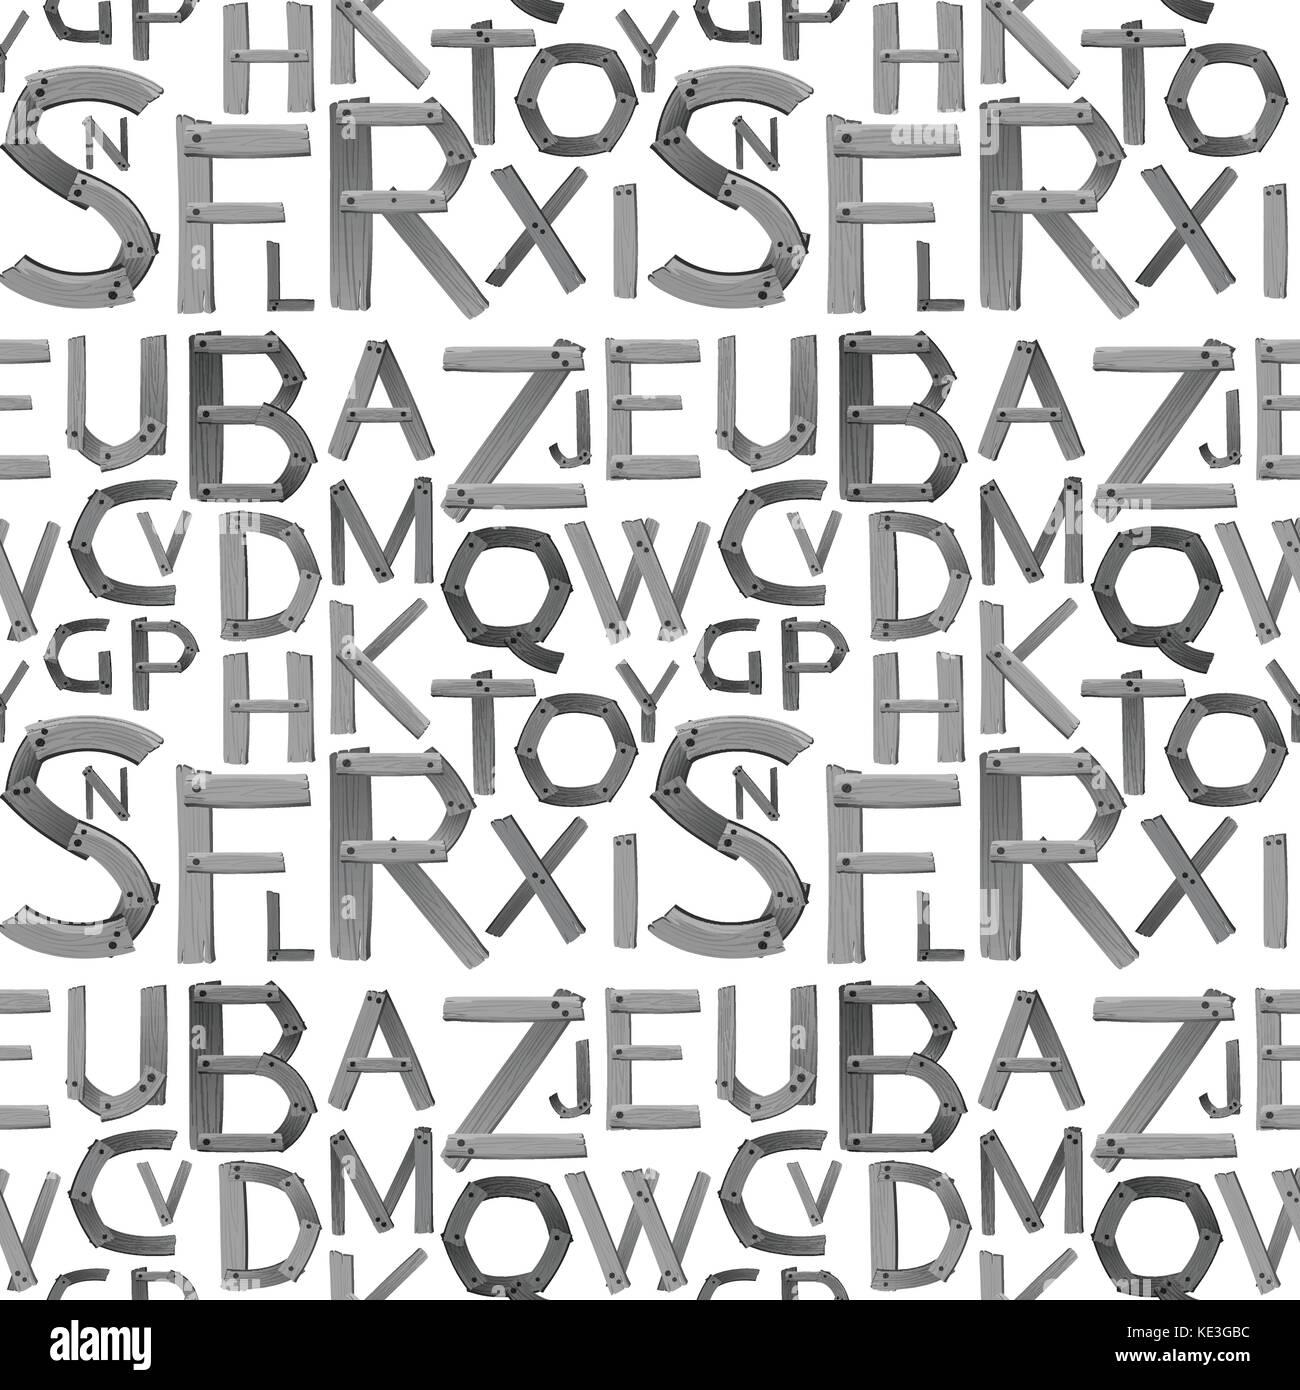 Seamless gray English alphabets illustration - Stock Vector